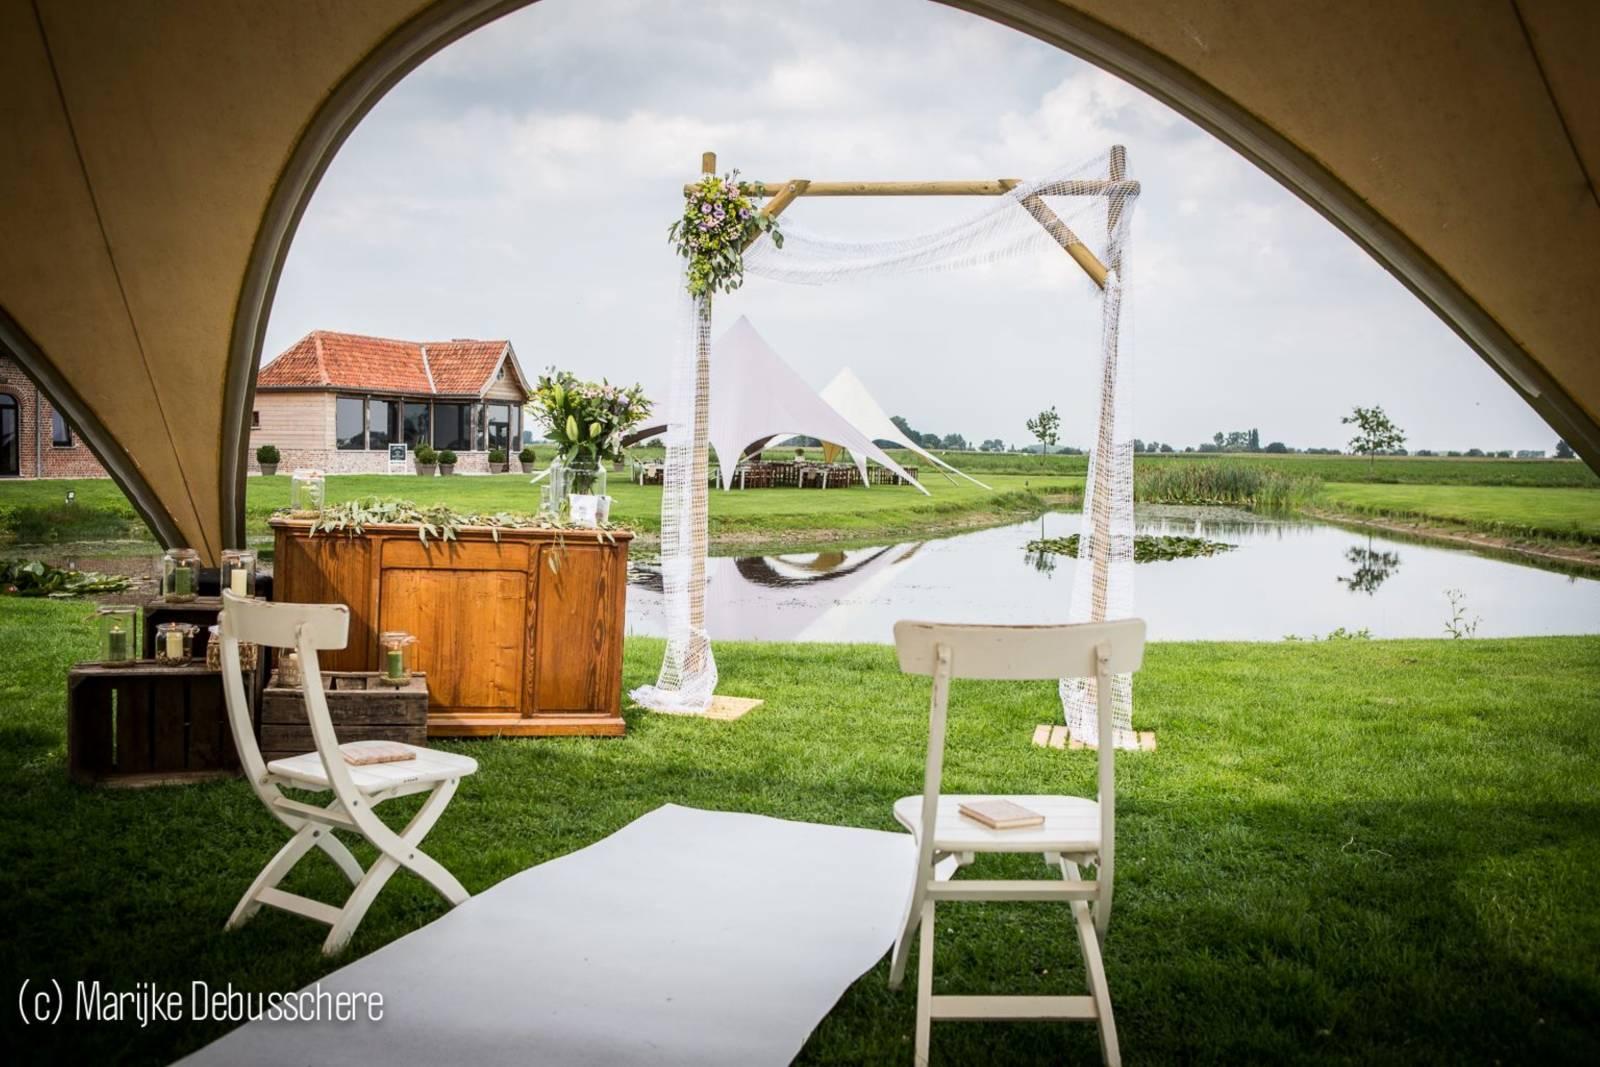 House of Weddings Domein t Eikennest Feestzaal West-Vlaanderen Diksmuide Beerst Tuin Park Vijver Tent Ceremonie Schuur pold (18)